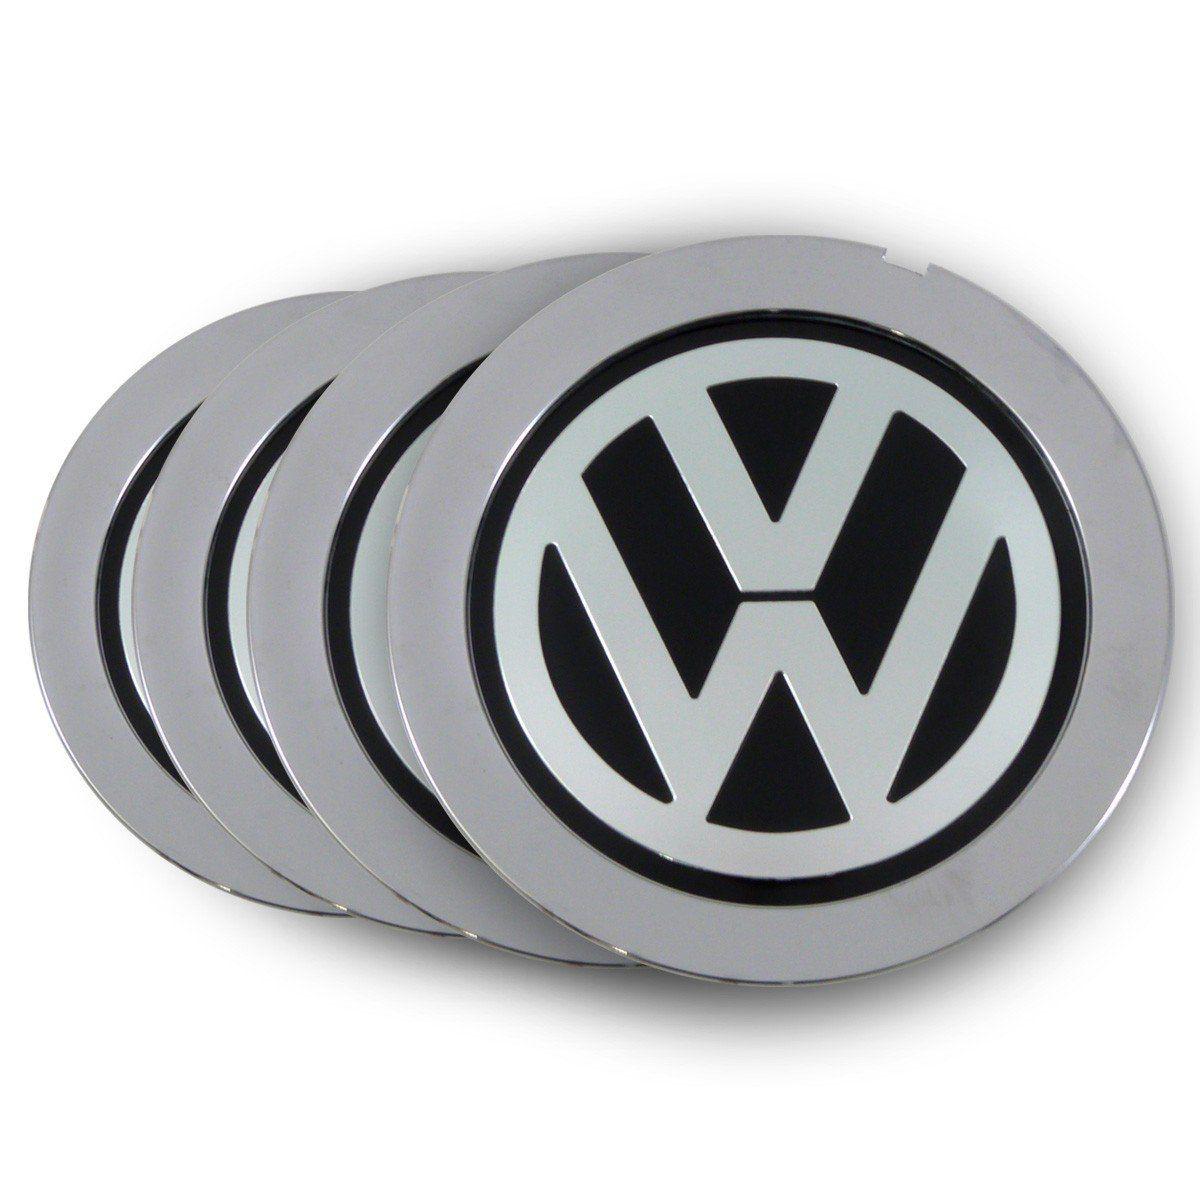 Jogo Calota Centro De Roda Cromado Audi A8 - Kromma Vw